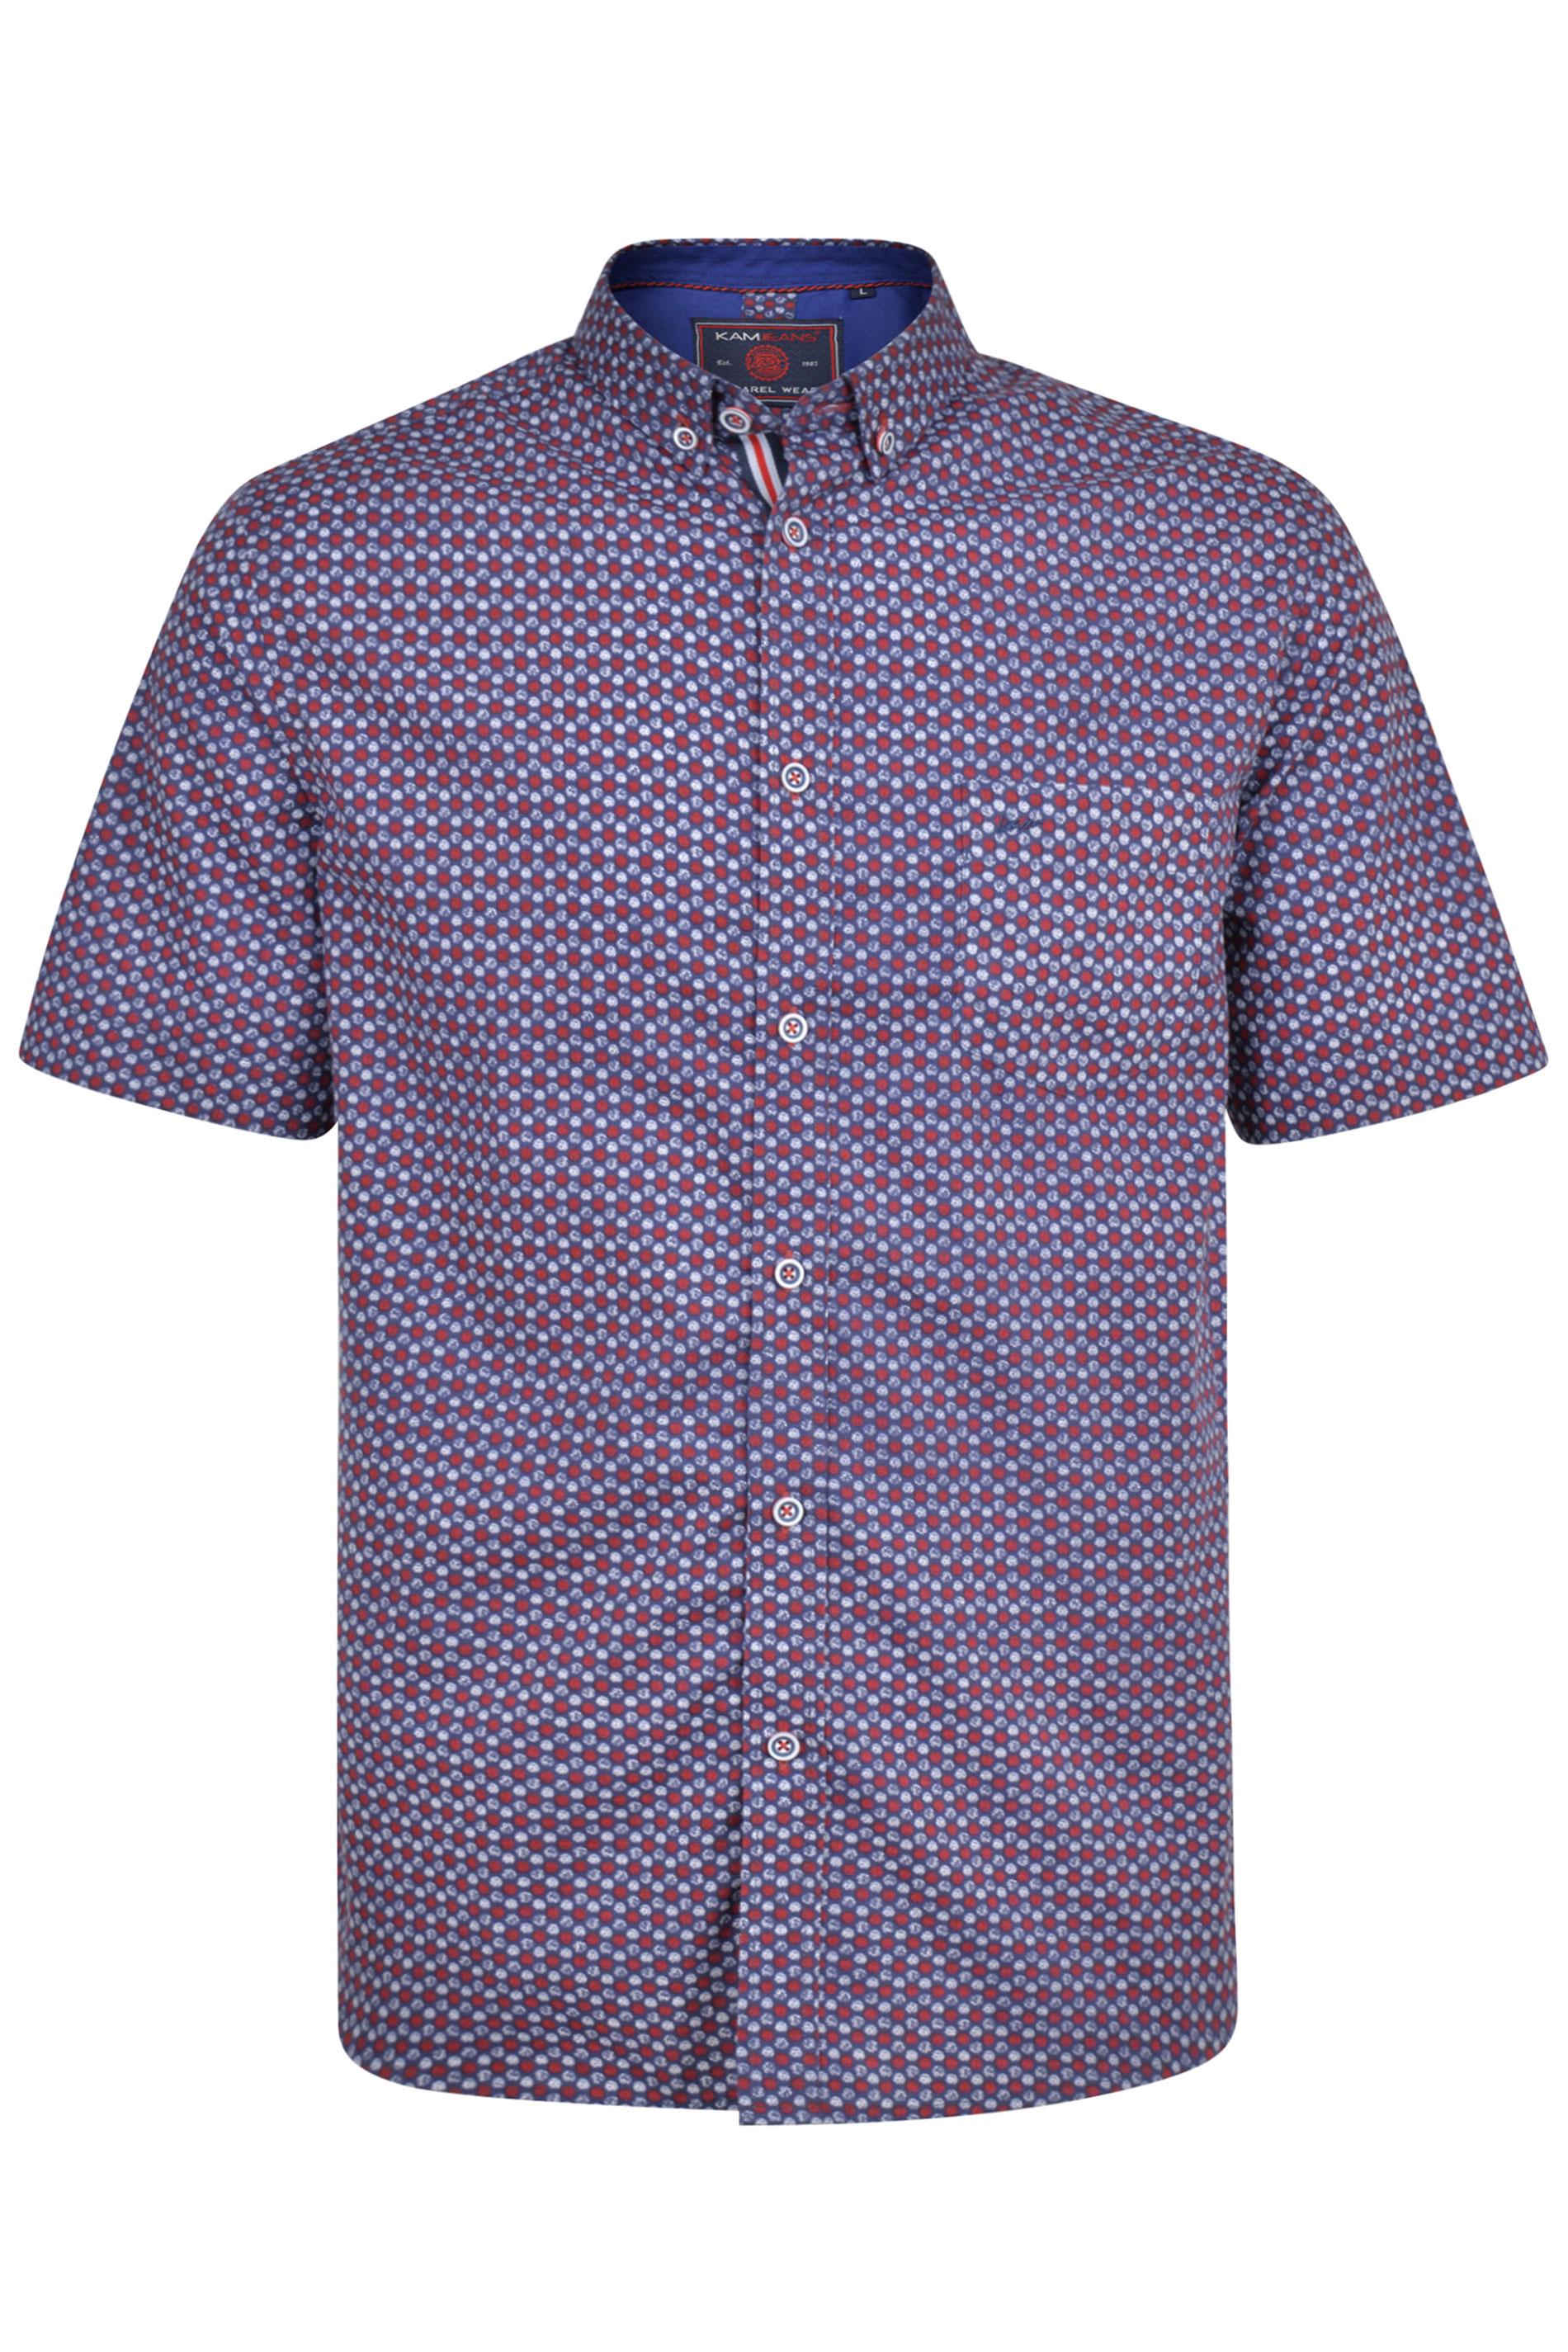 KAM Navy Dobby Shirt